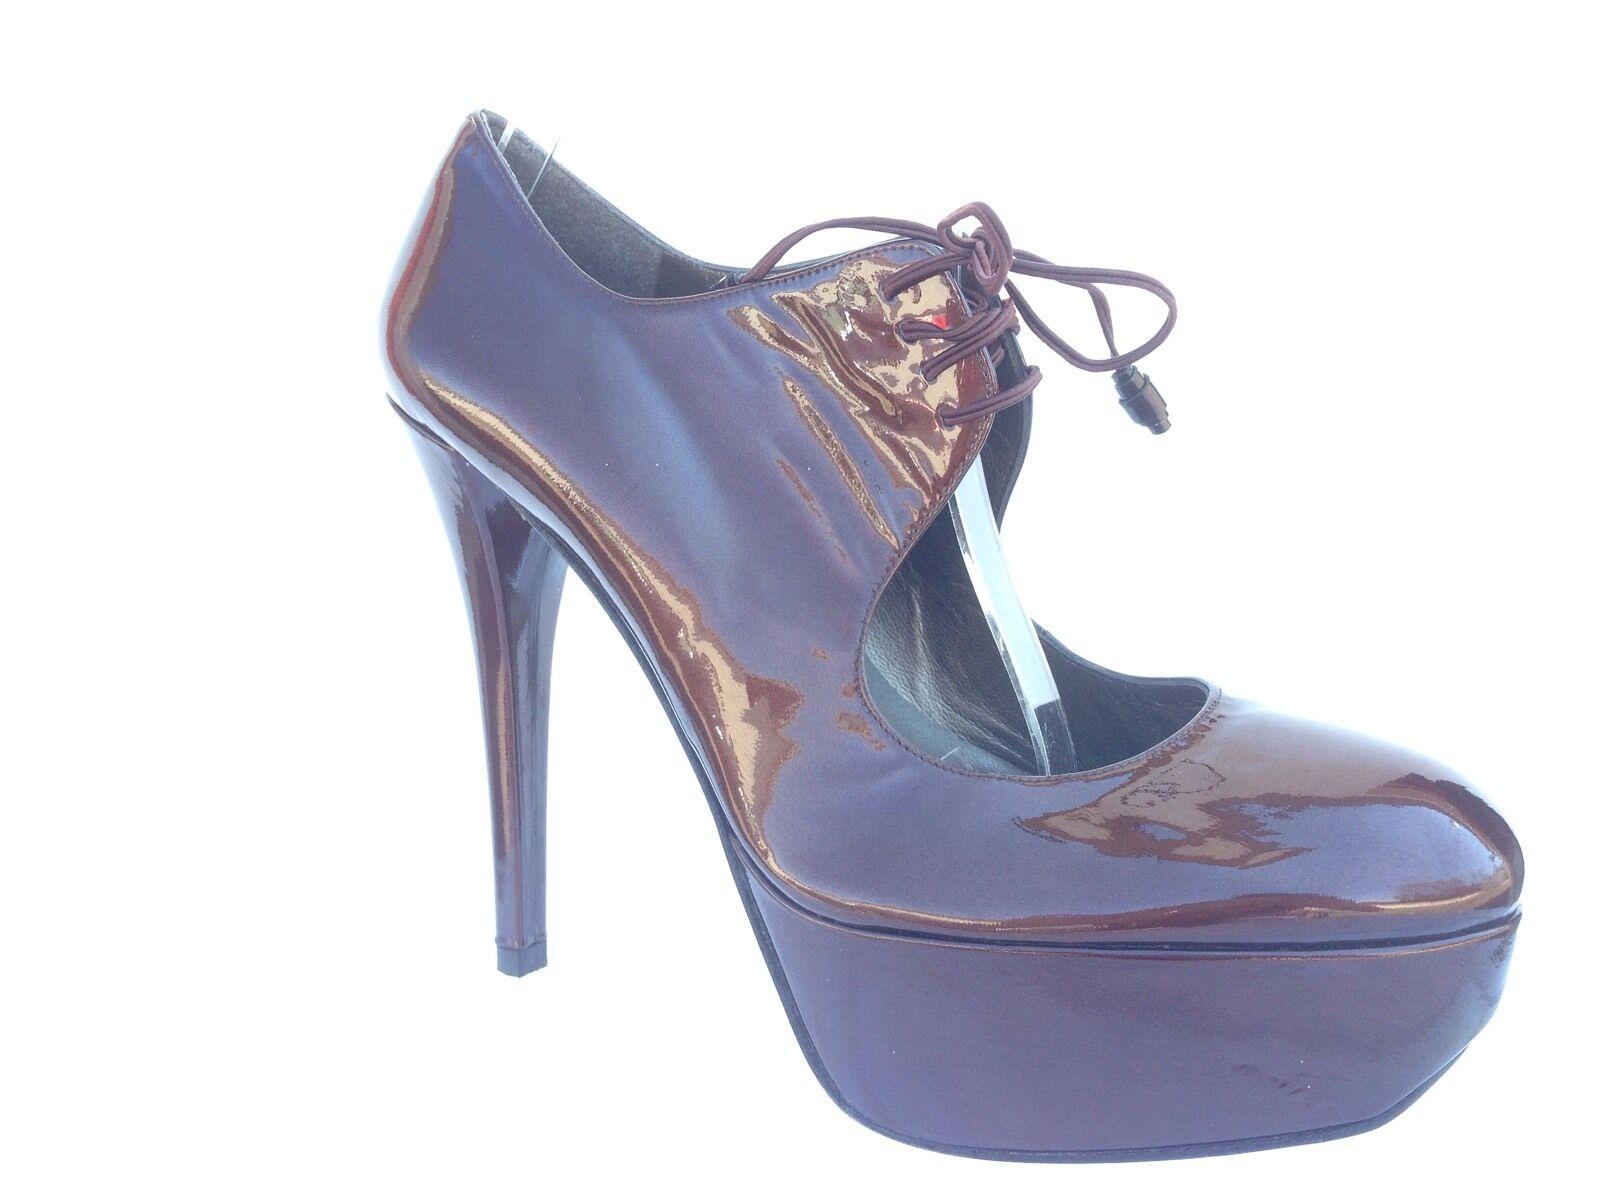 Display  Stuart Weitzman Time Platform Lace Up avvioie Pumps Heels 8.5 NWOB  595